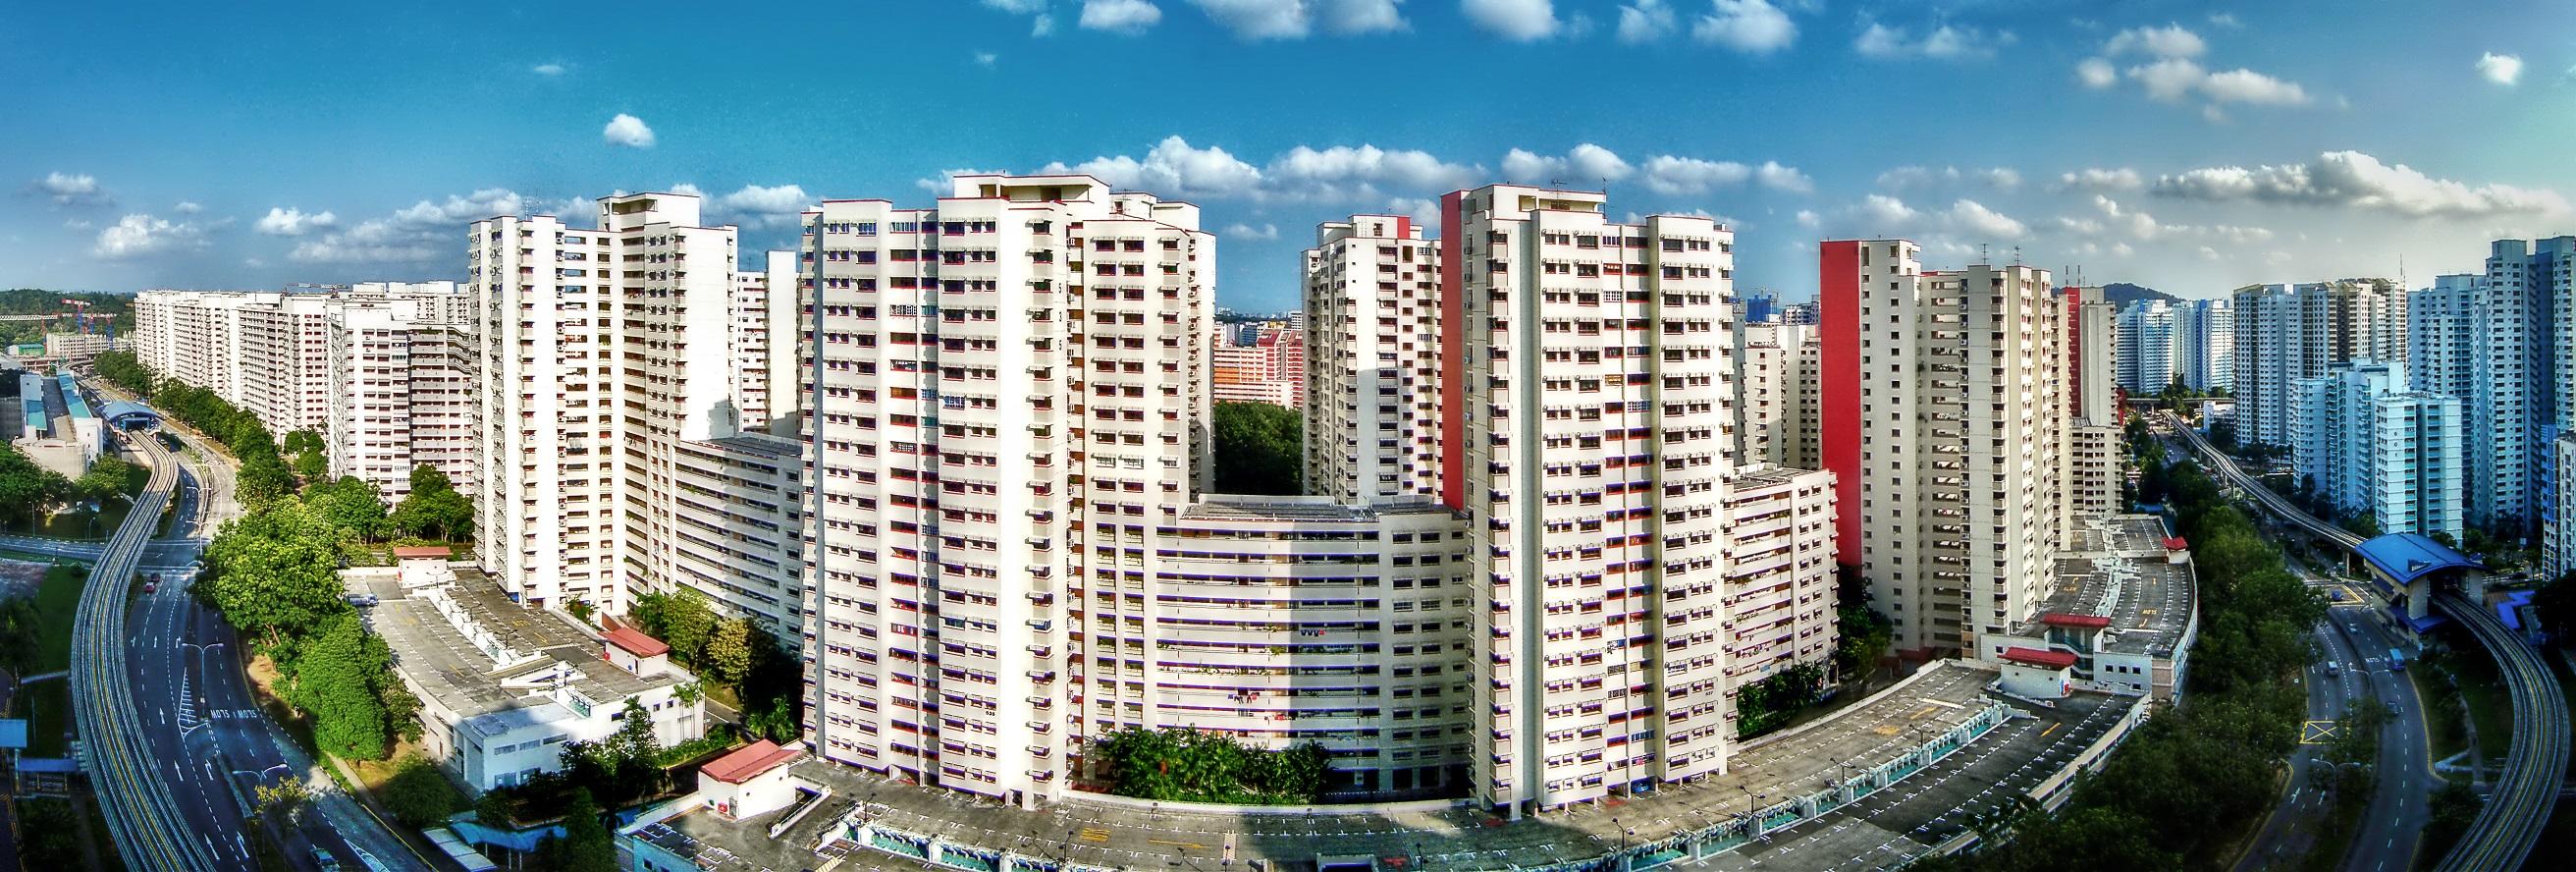 HDB flats in Bukit Panjang